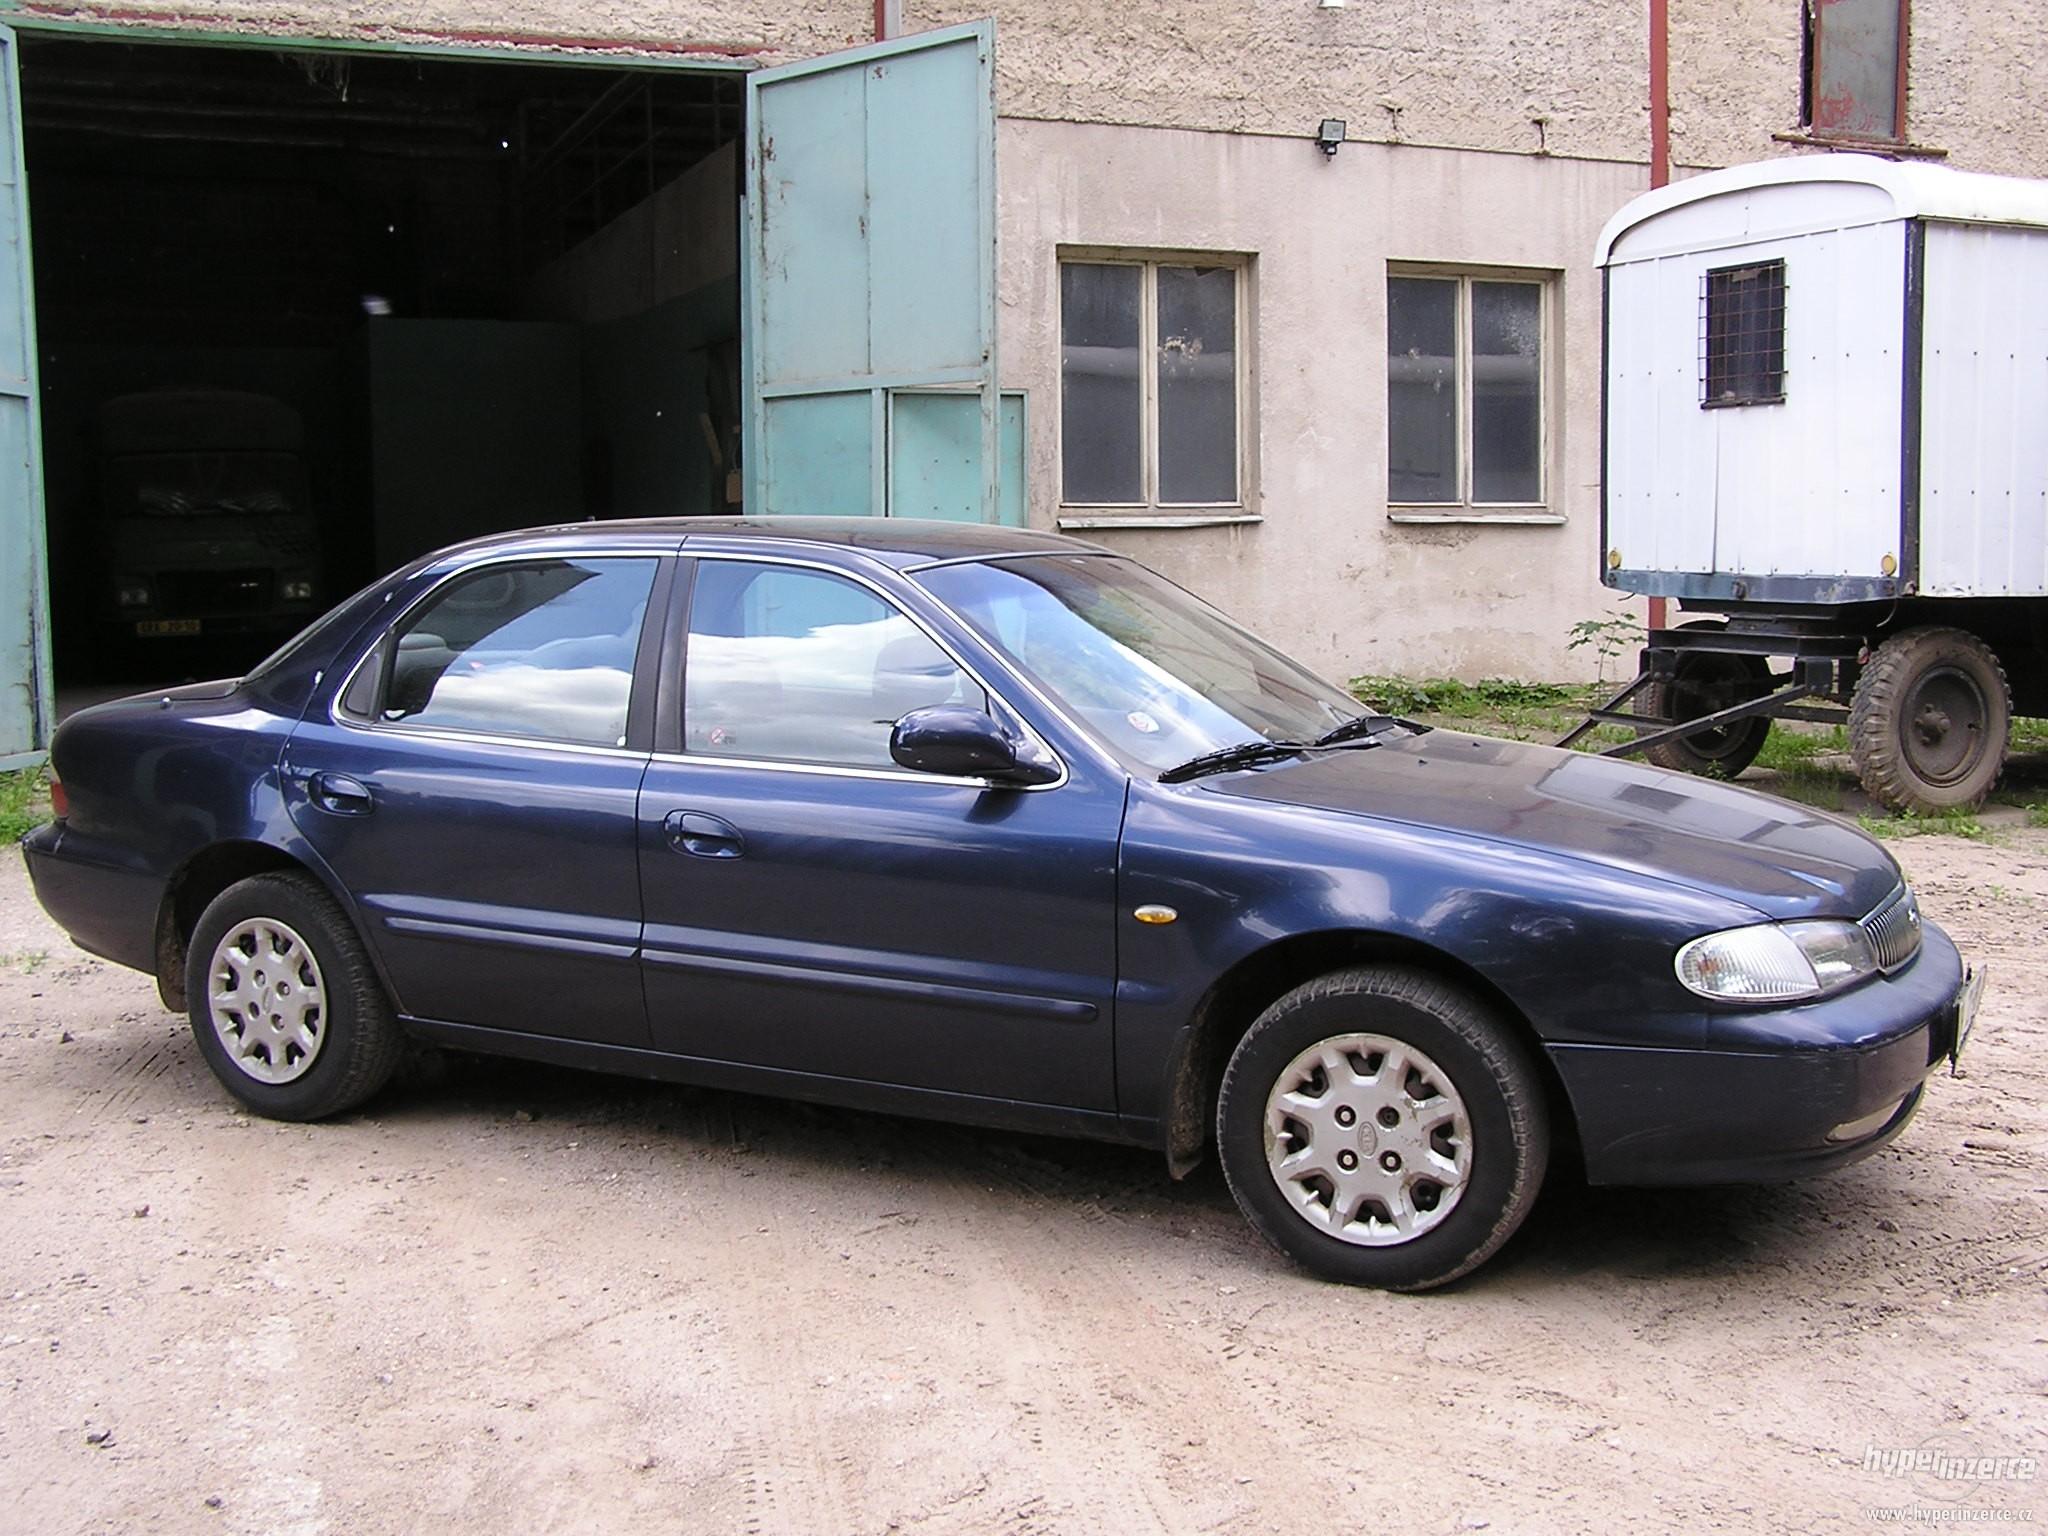 1997 kia clarus service and repair manual rh repairmanualnow com kia clarus 2000 service manual Kia Clarus RHD